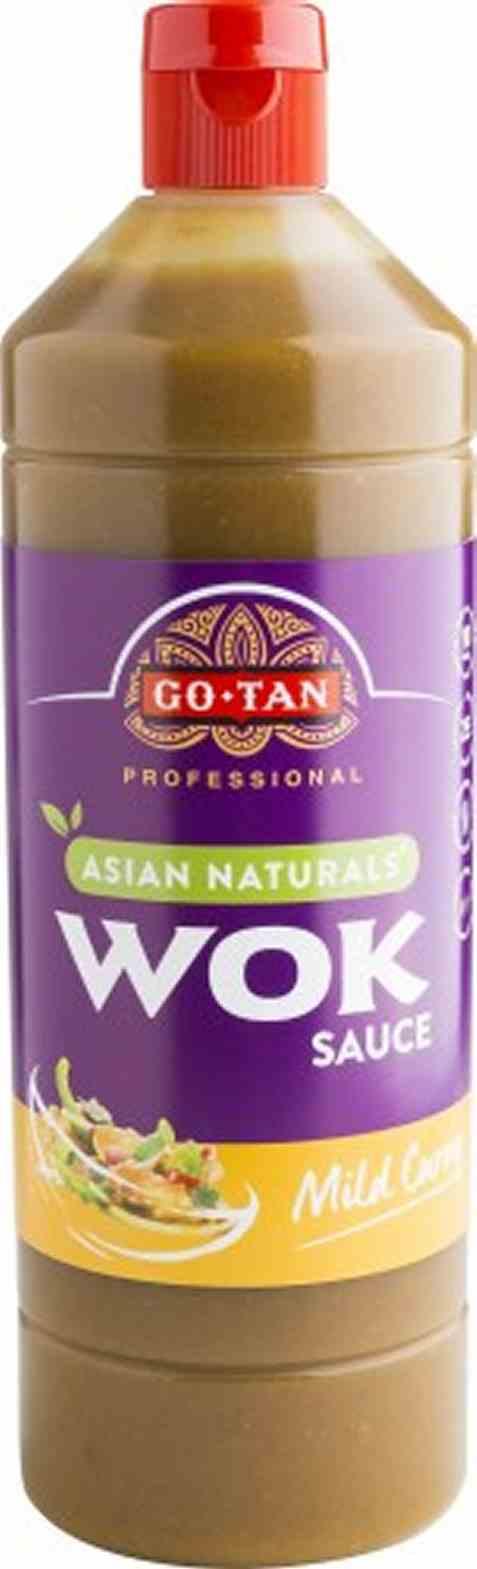 Bilde av Go-tan Asian Naturals Woksaus Mild Curry 1 liter.